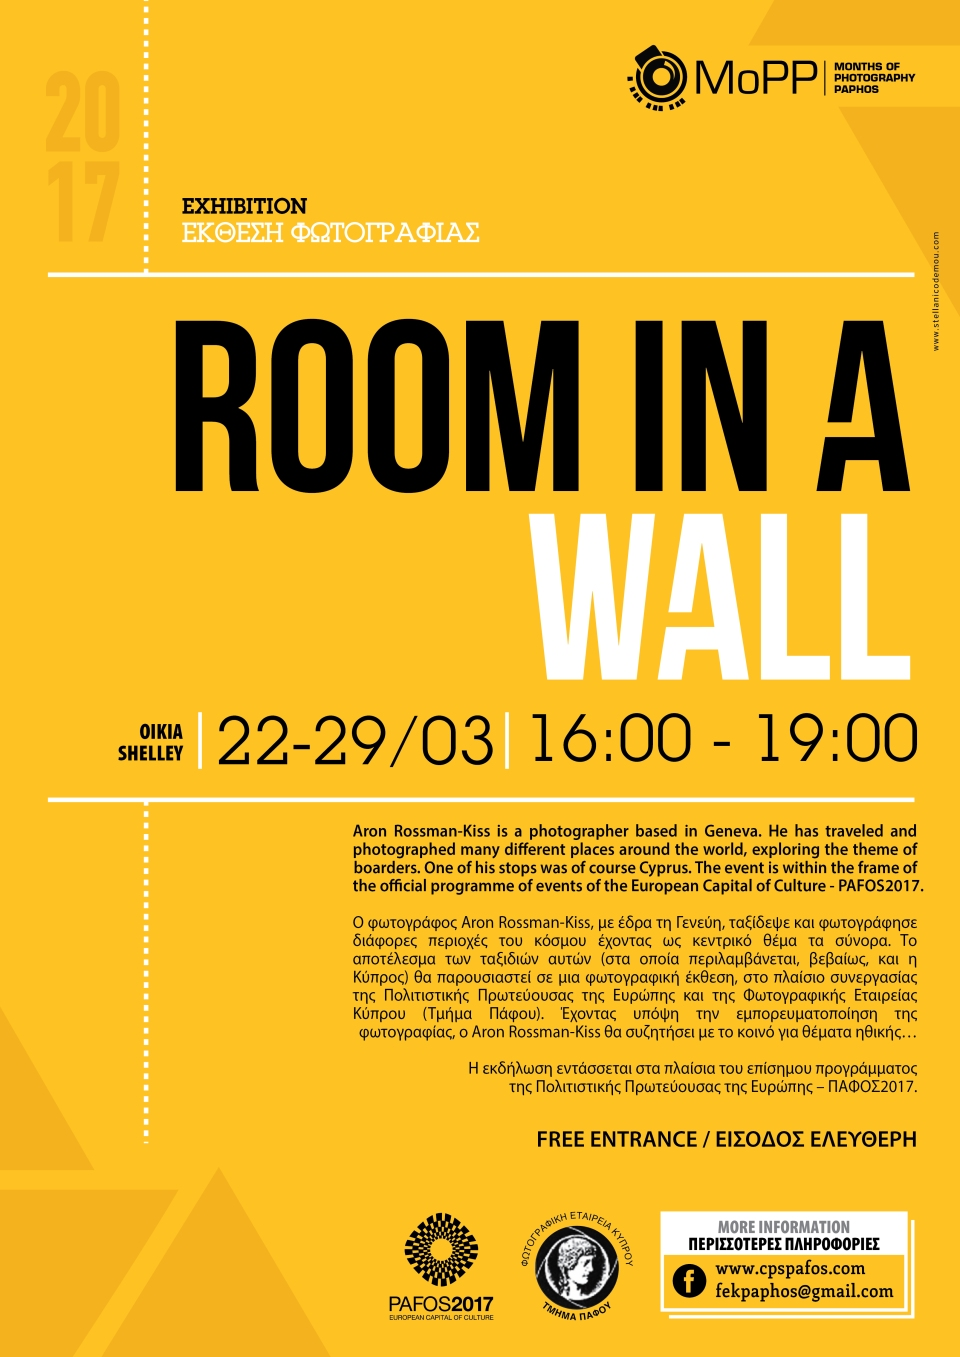 RoomInaWall-Exhibition-2017-01